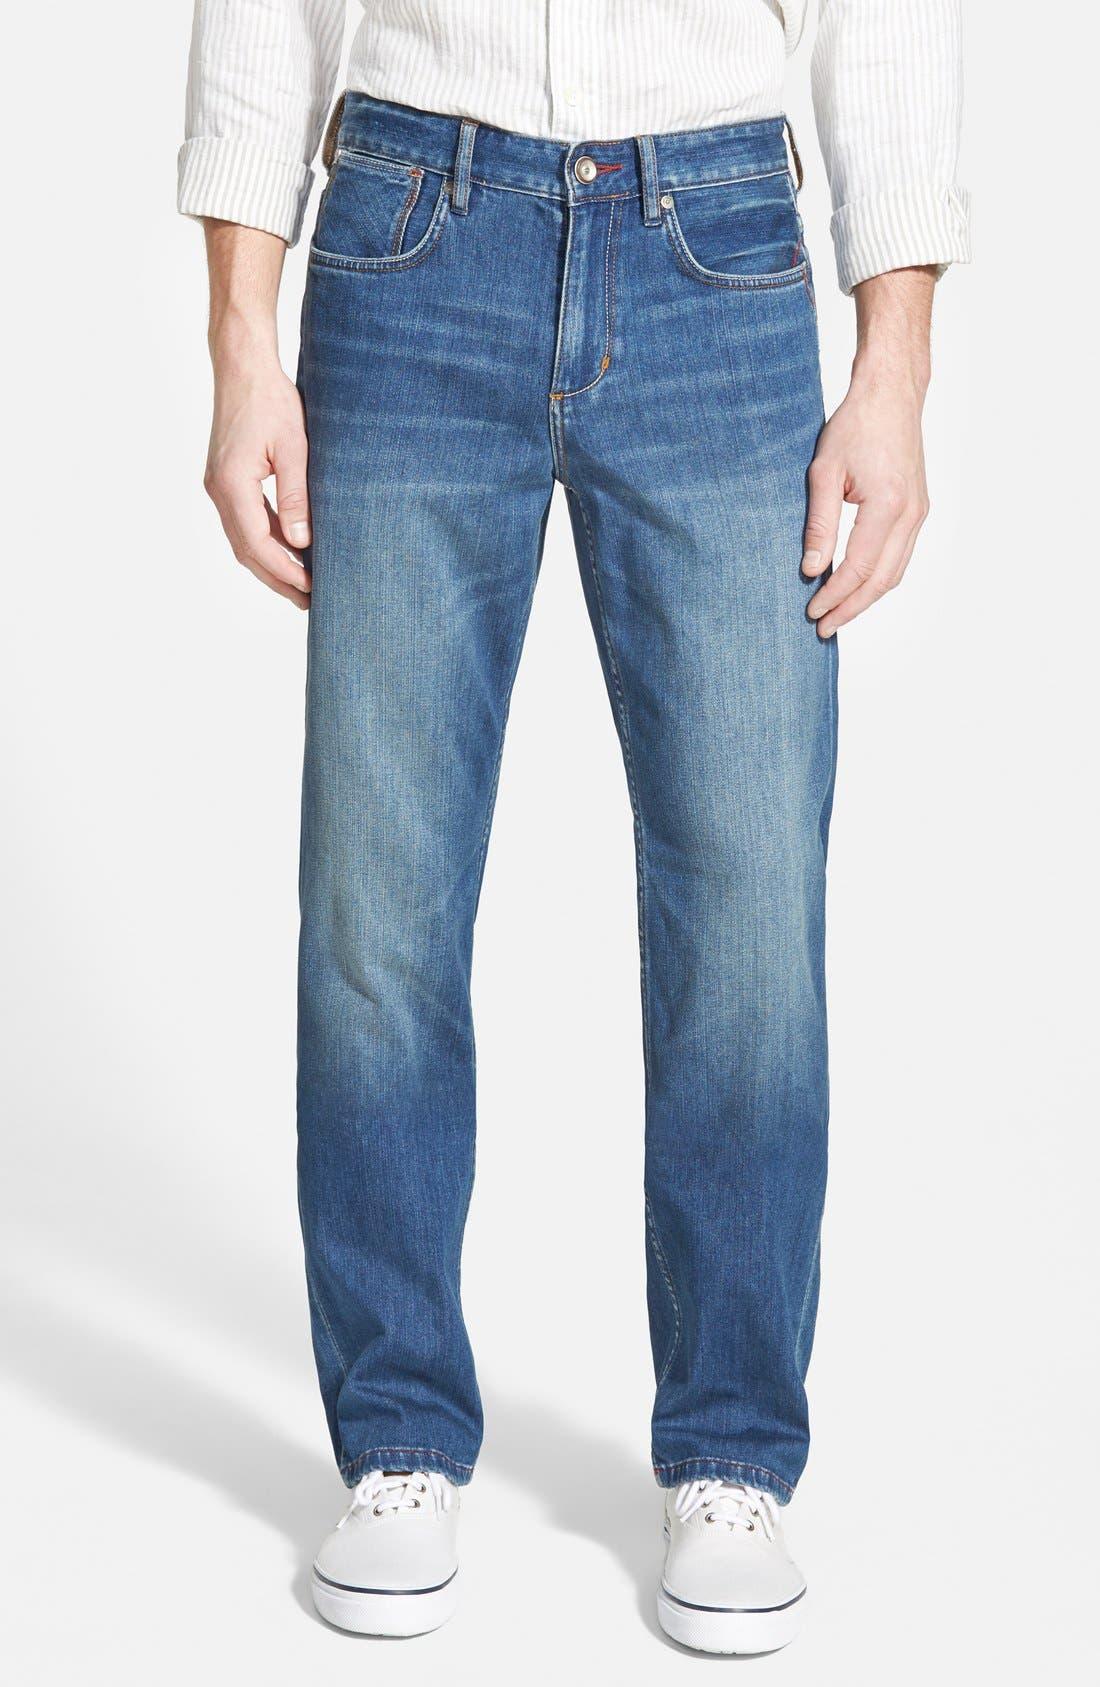 Main Image - Tommy Bahama Denim 'Cooper' Straight Leg Jeans (Blue Overdye)